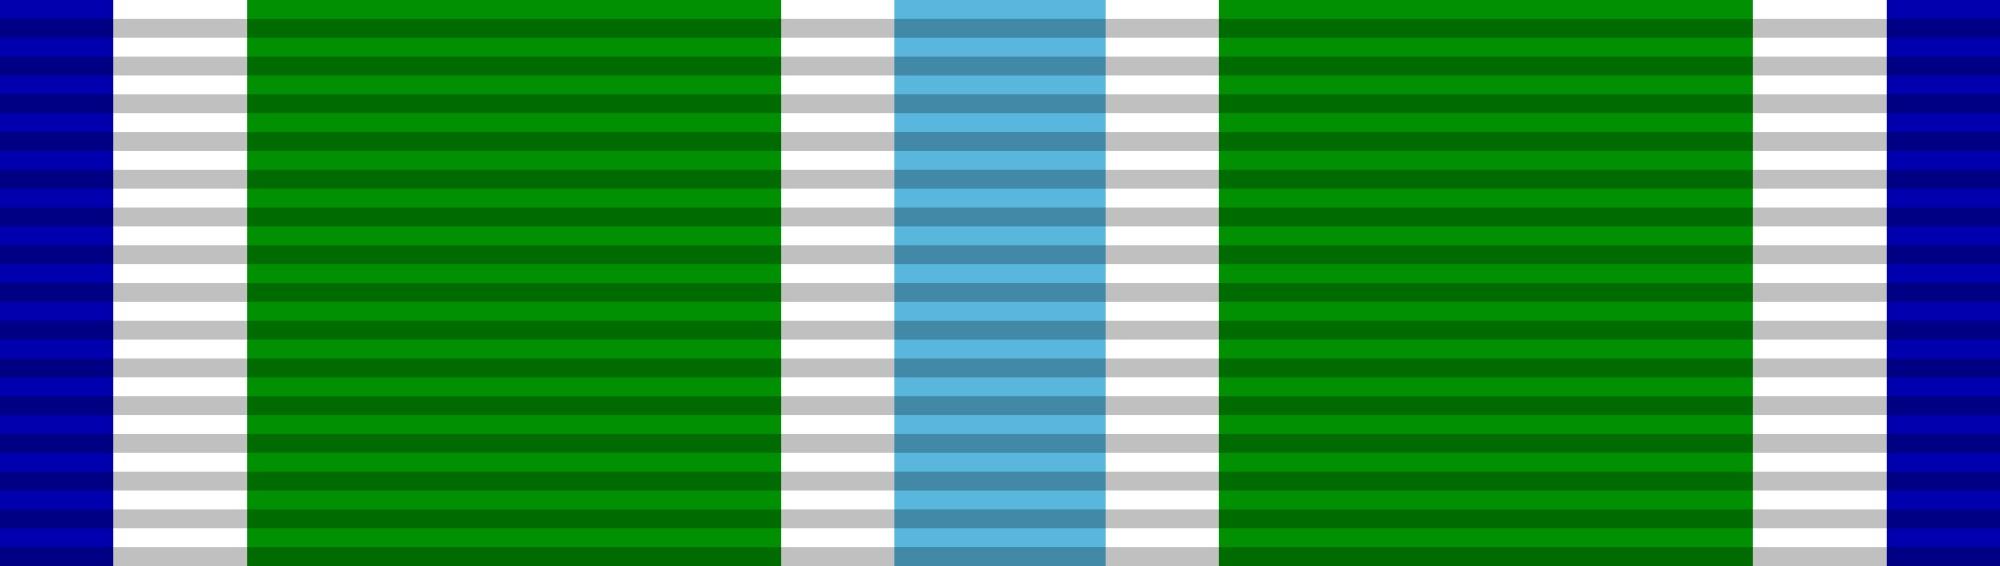 Coast Guard Meritorious Unit Commendation